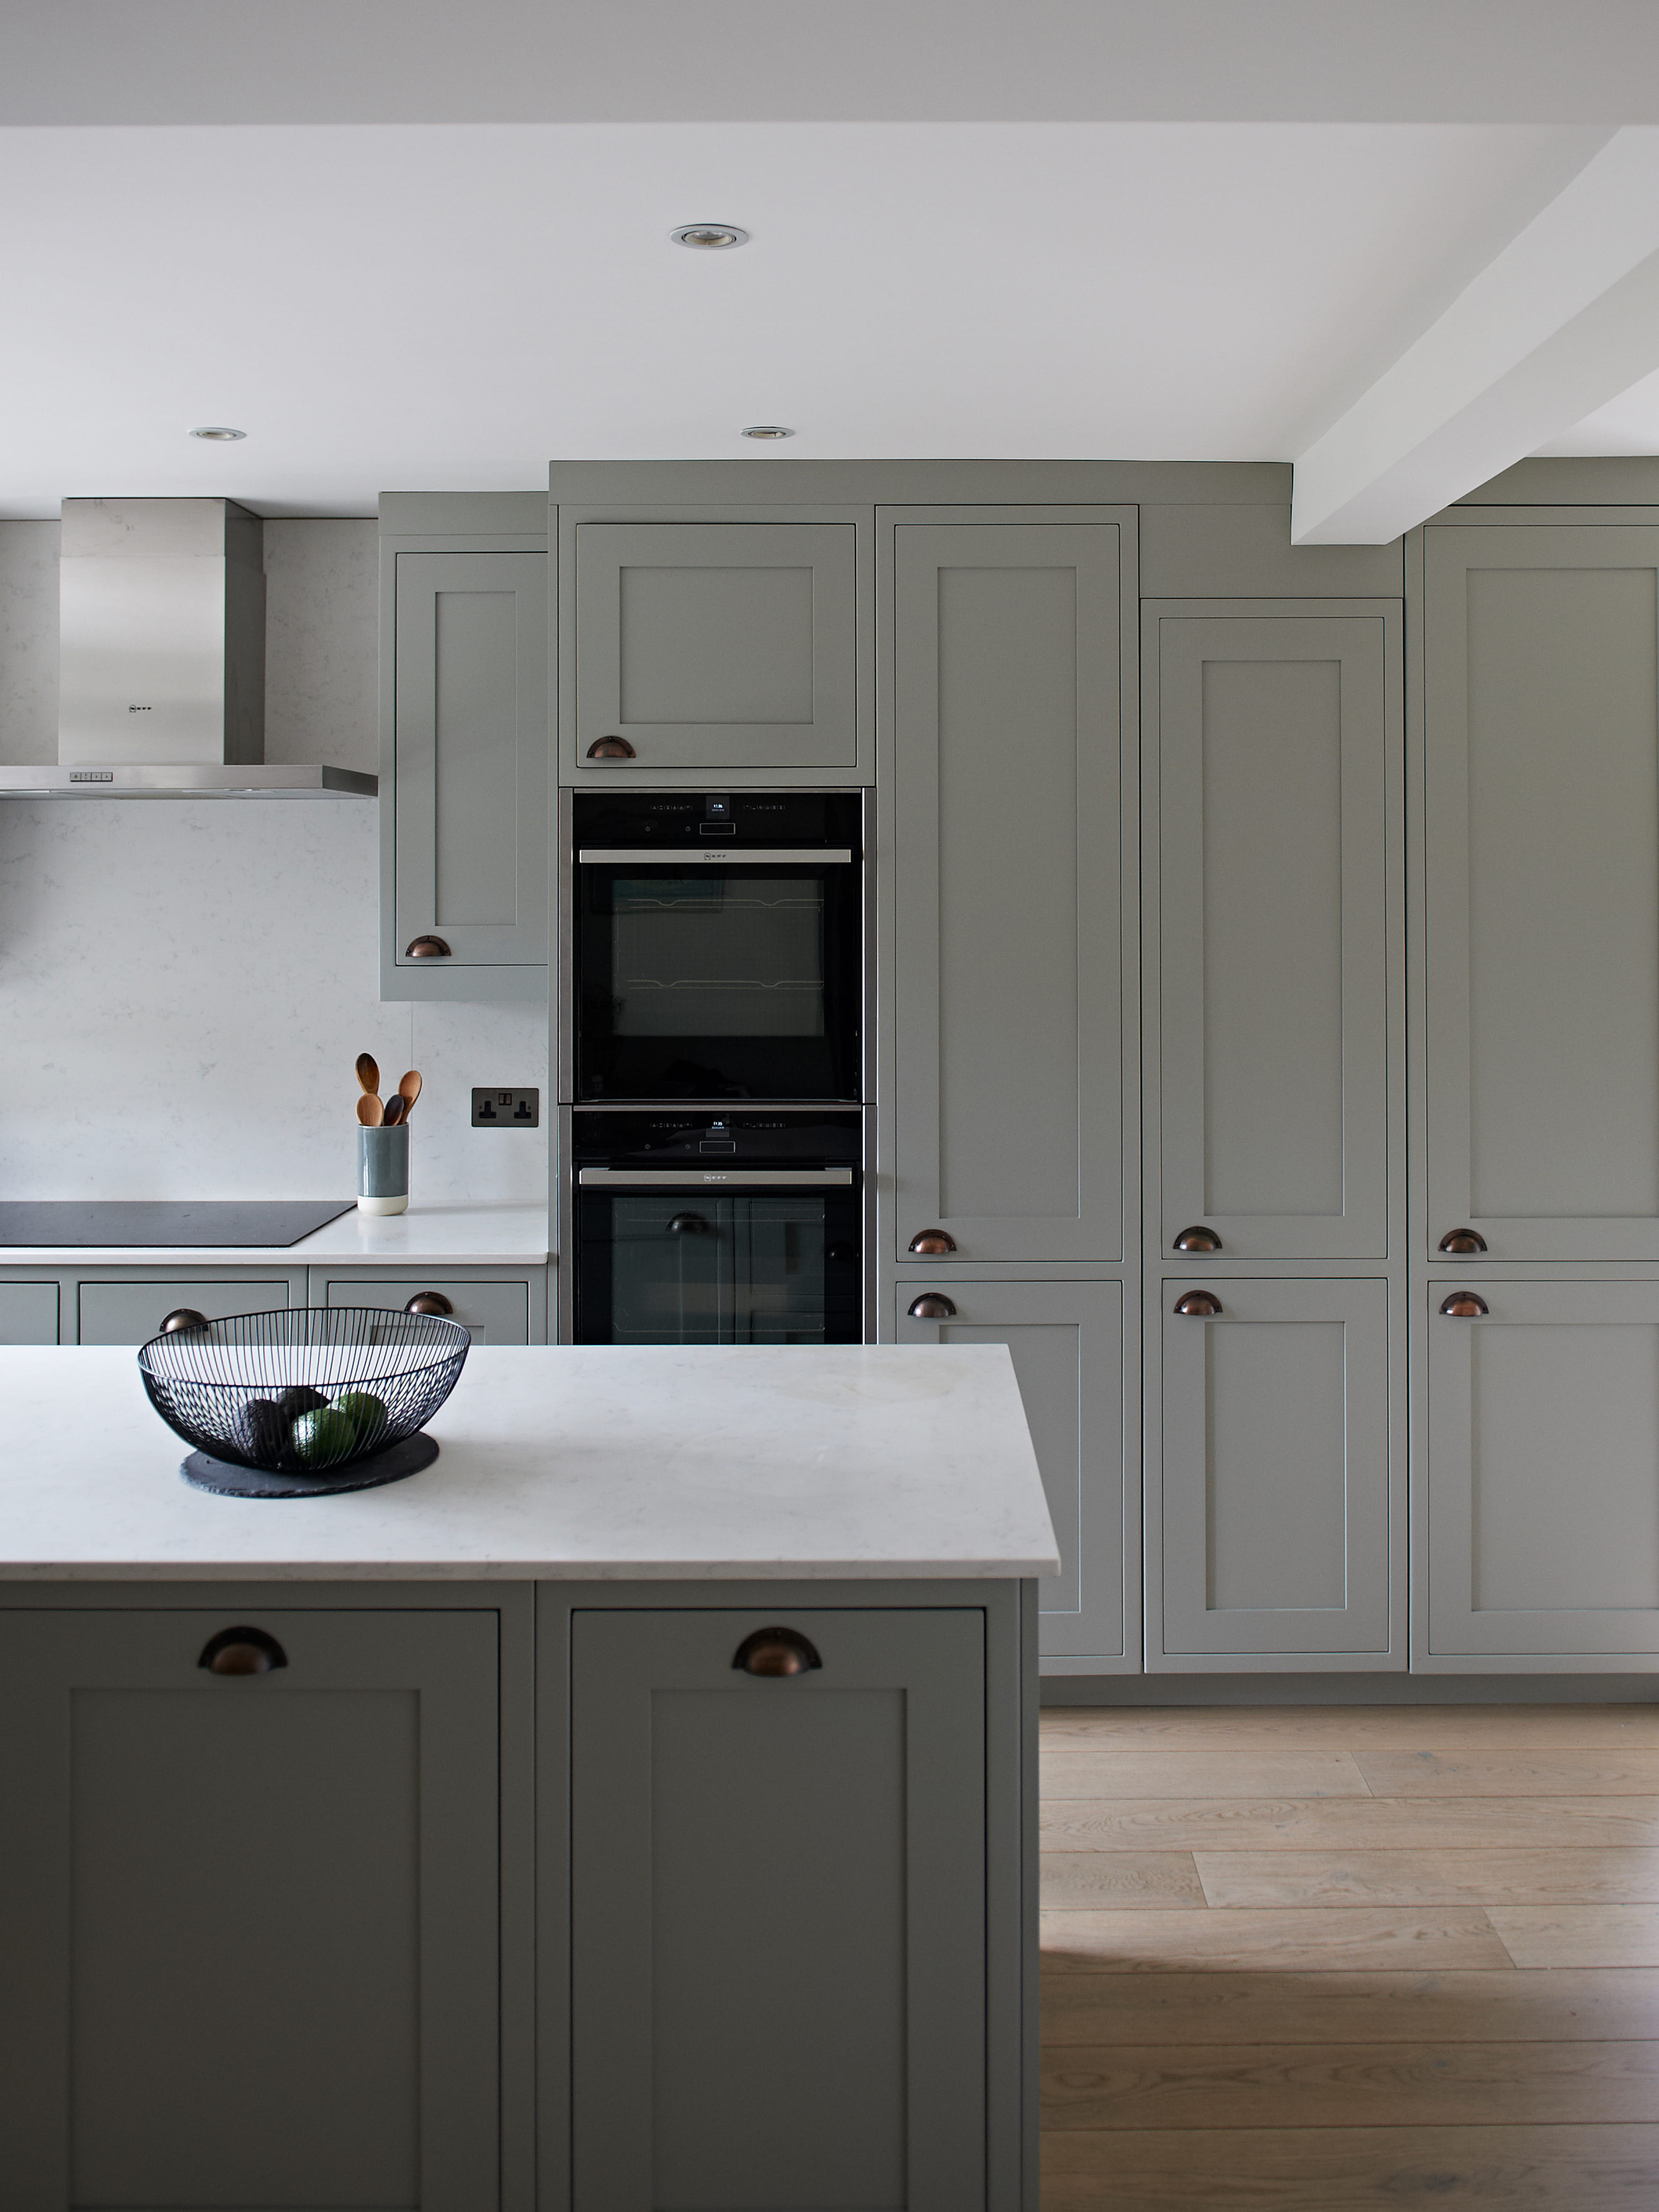 https://www.designer-kitchens.co.uk/wp-content/uploads/2019/10/MAZURE02-000013.jpg